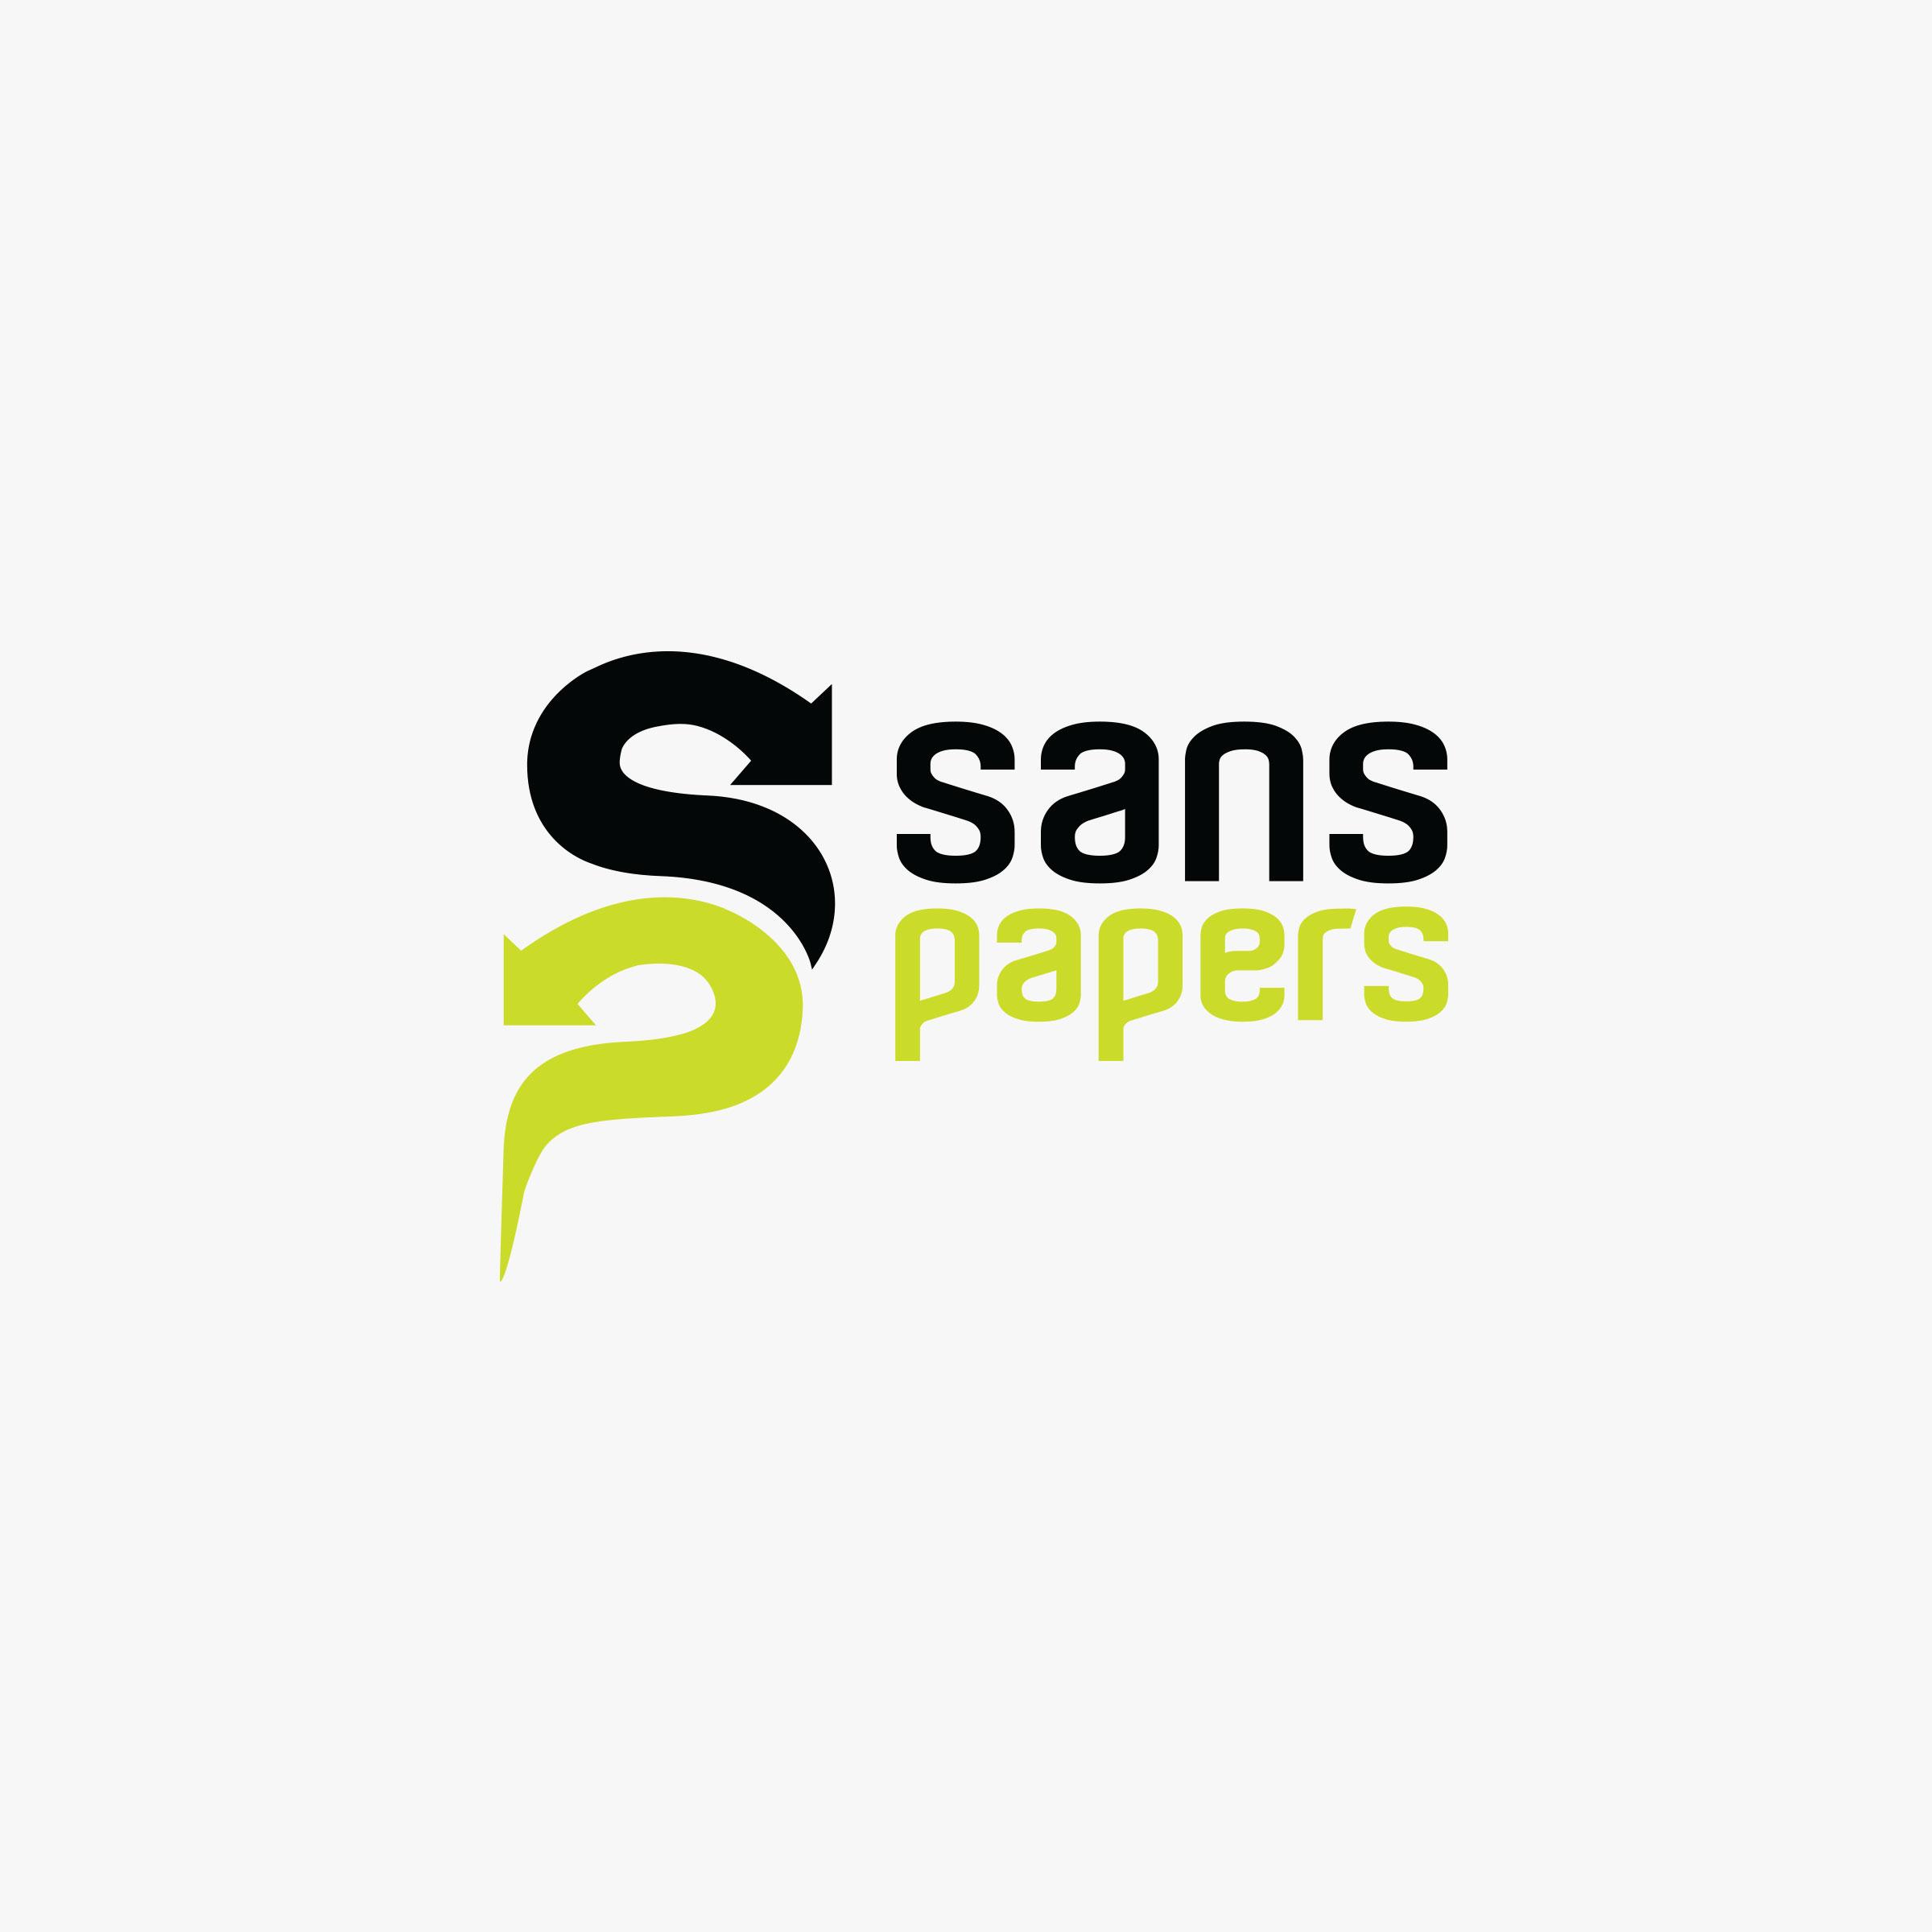 sans-paper-logo-design-by-create.jpg